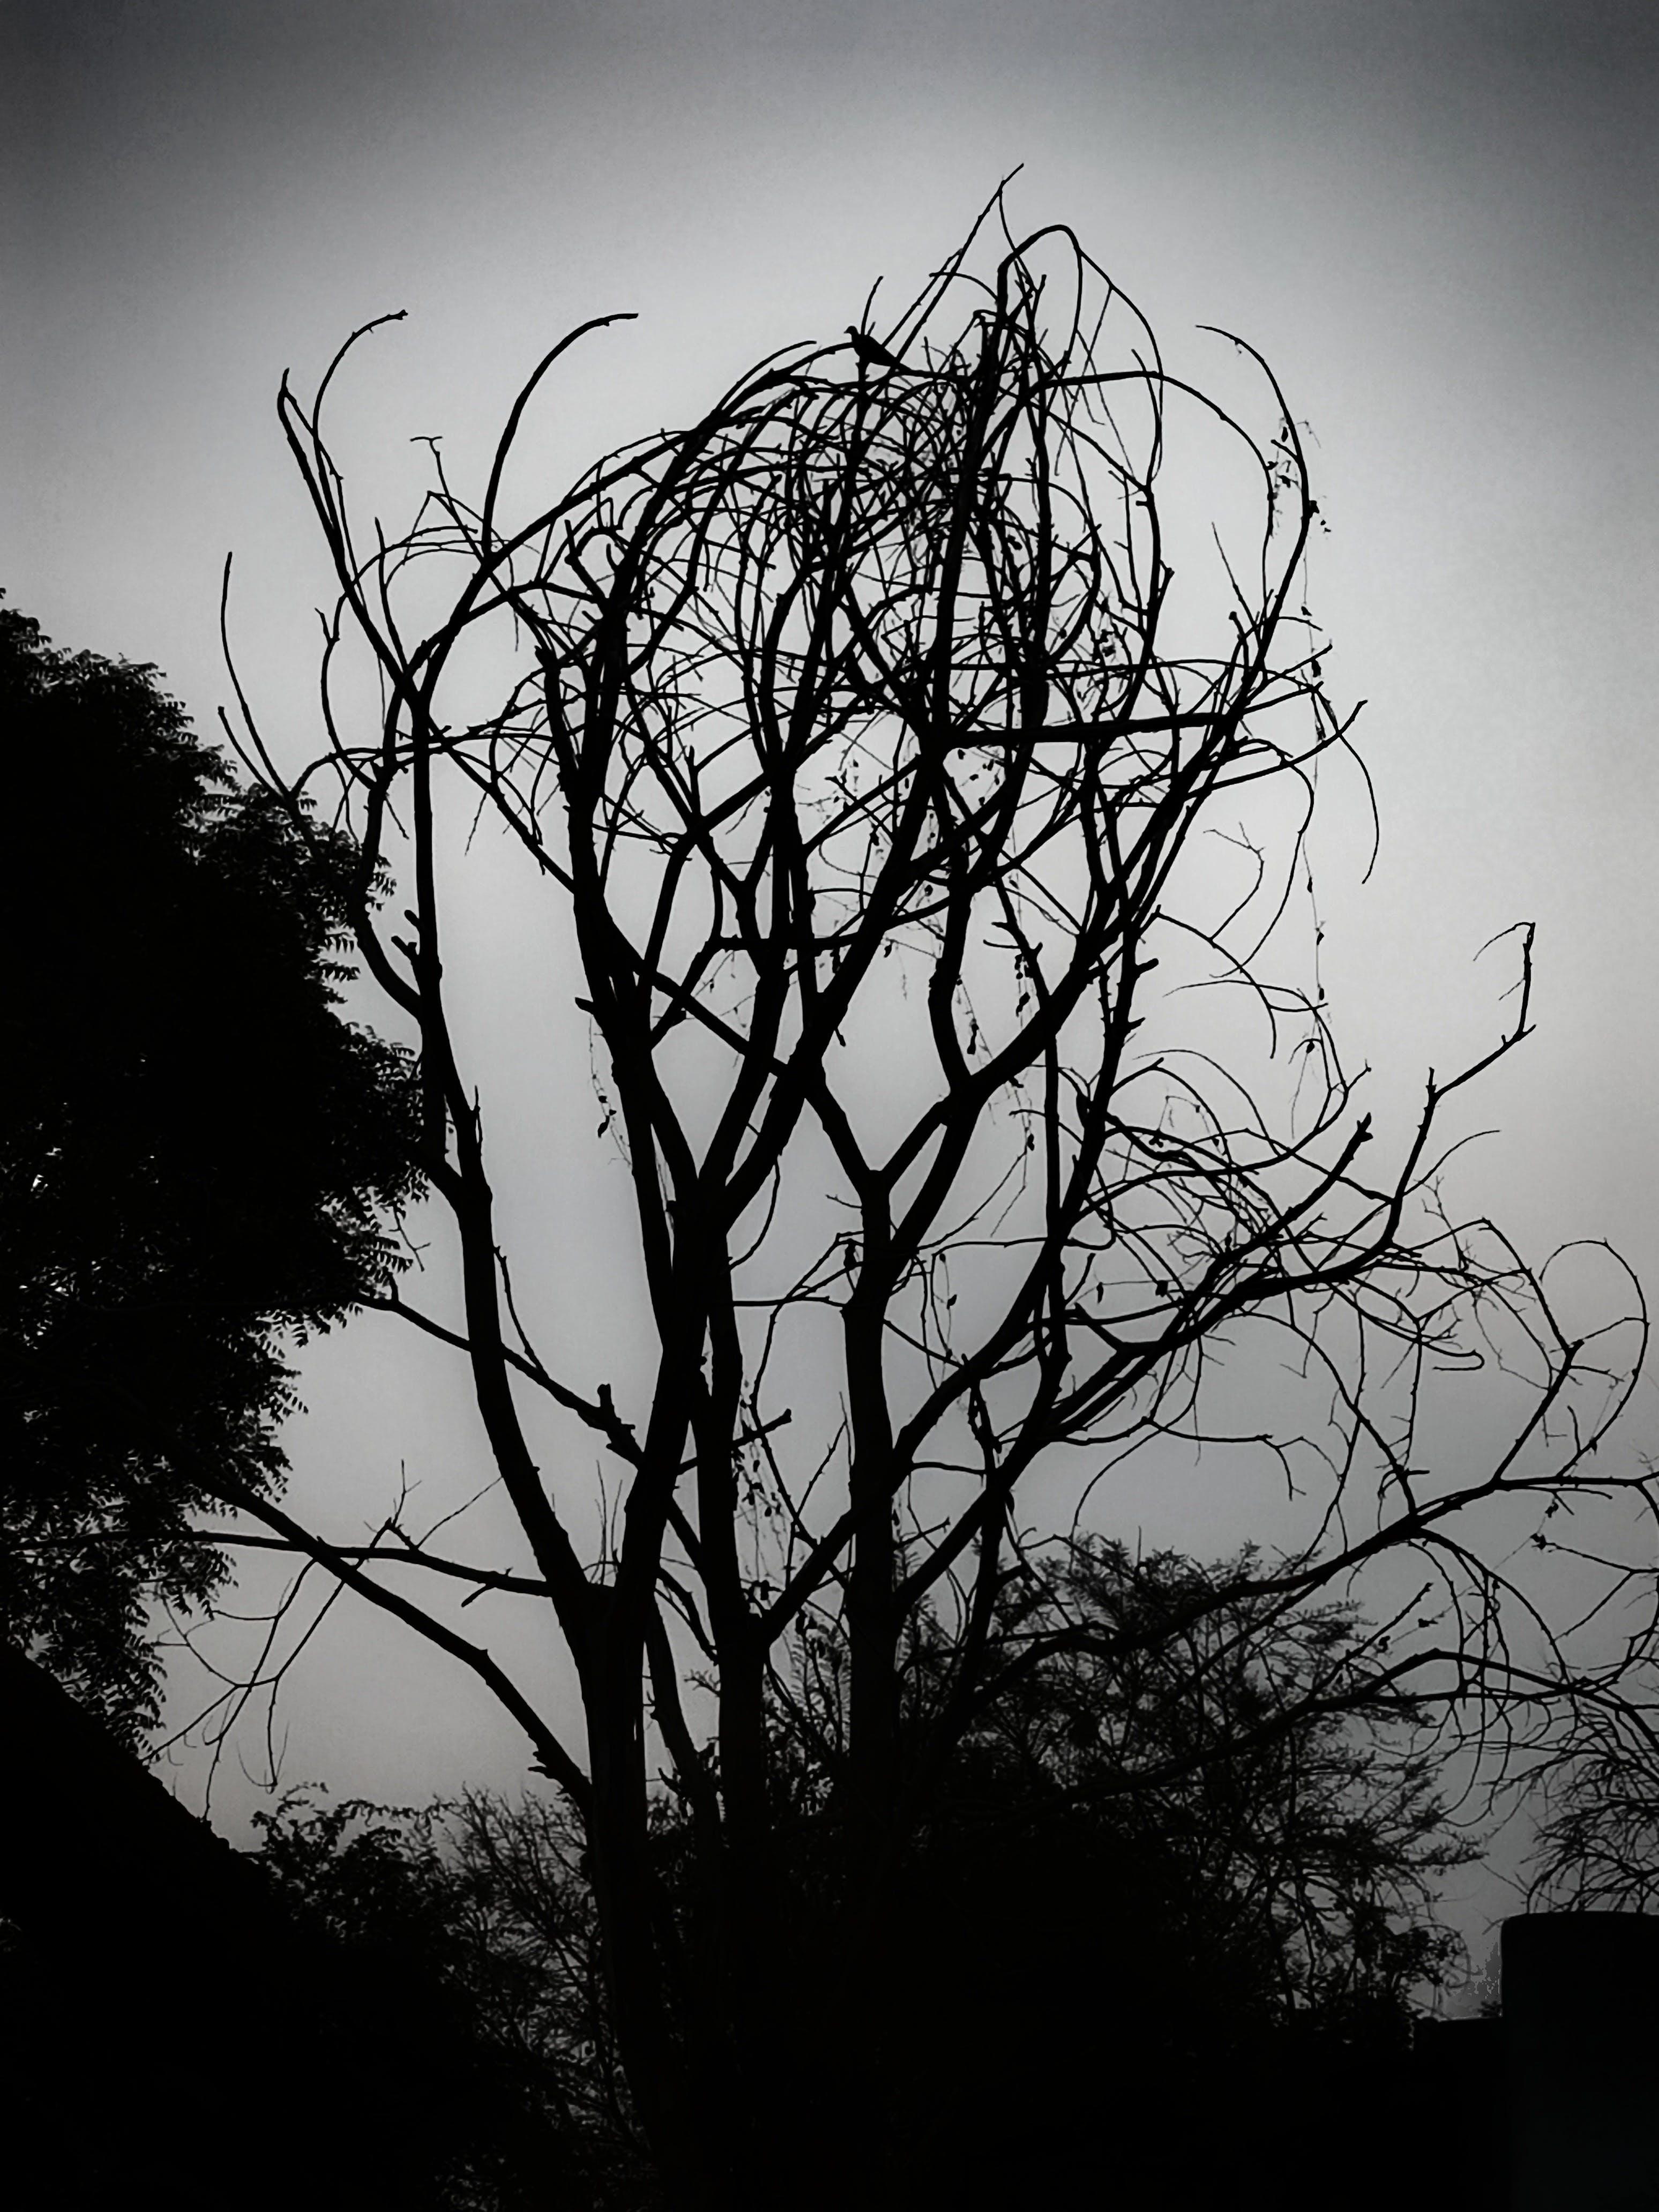 Gratis stockfoto met #autumn #nature #photography #sky #photooftheday #, #deadtree #nature #tree #photography #trees #sky #